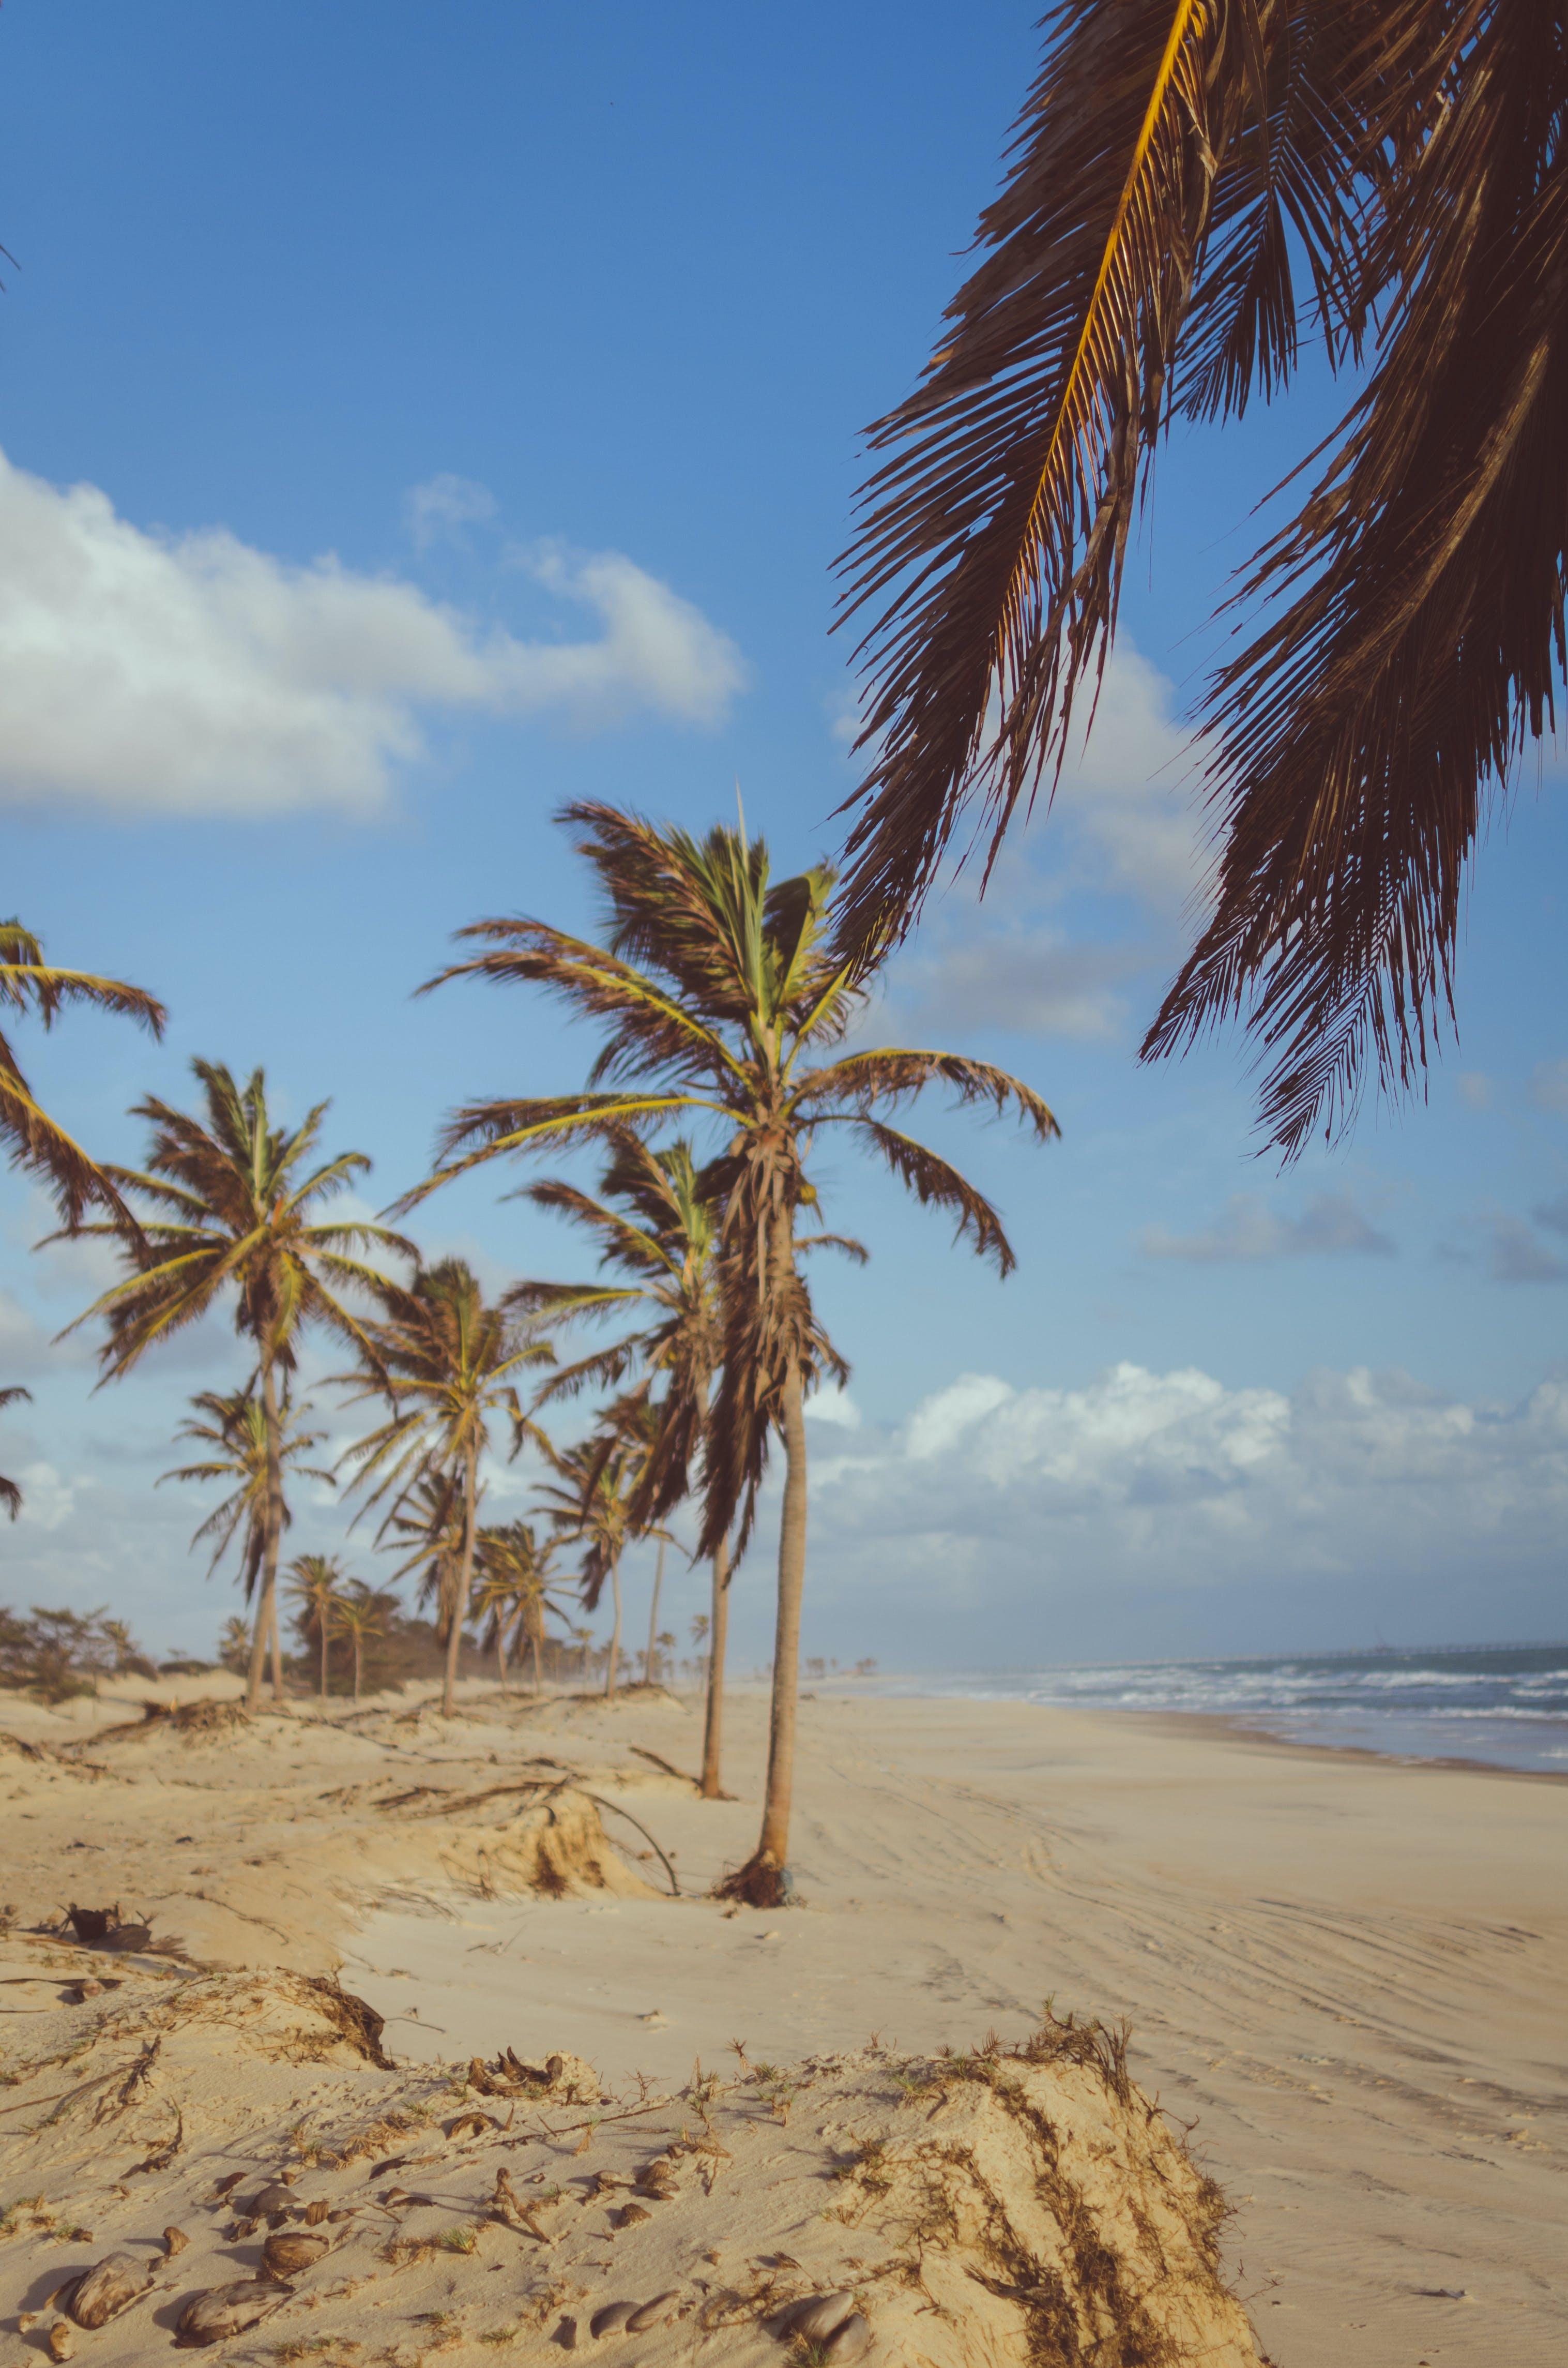 Coconut Tree Near Sea at Daytime